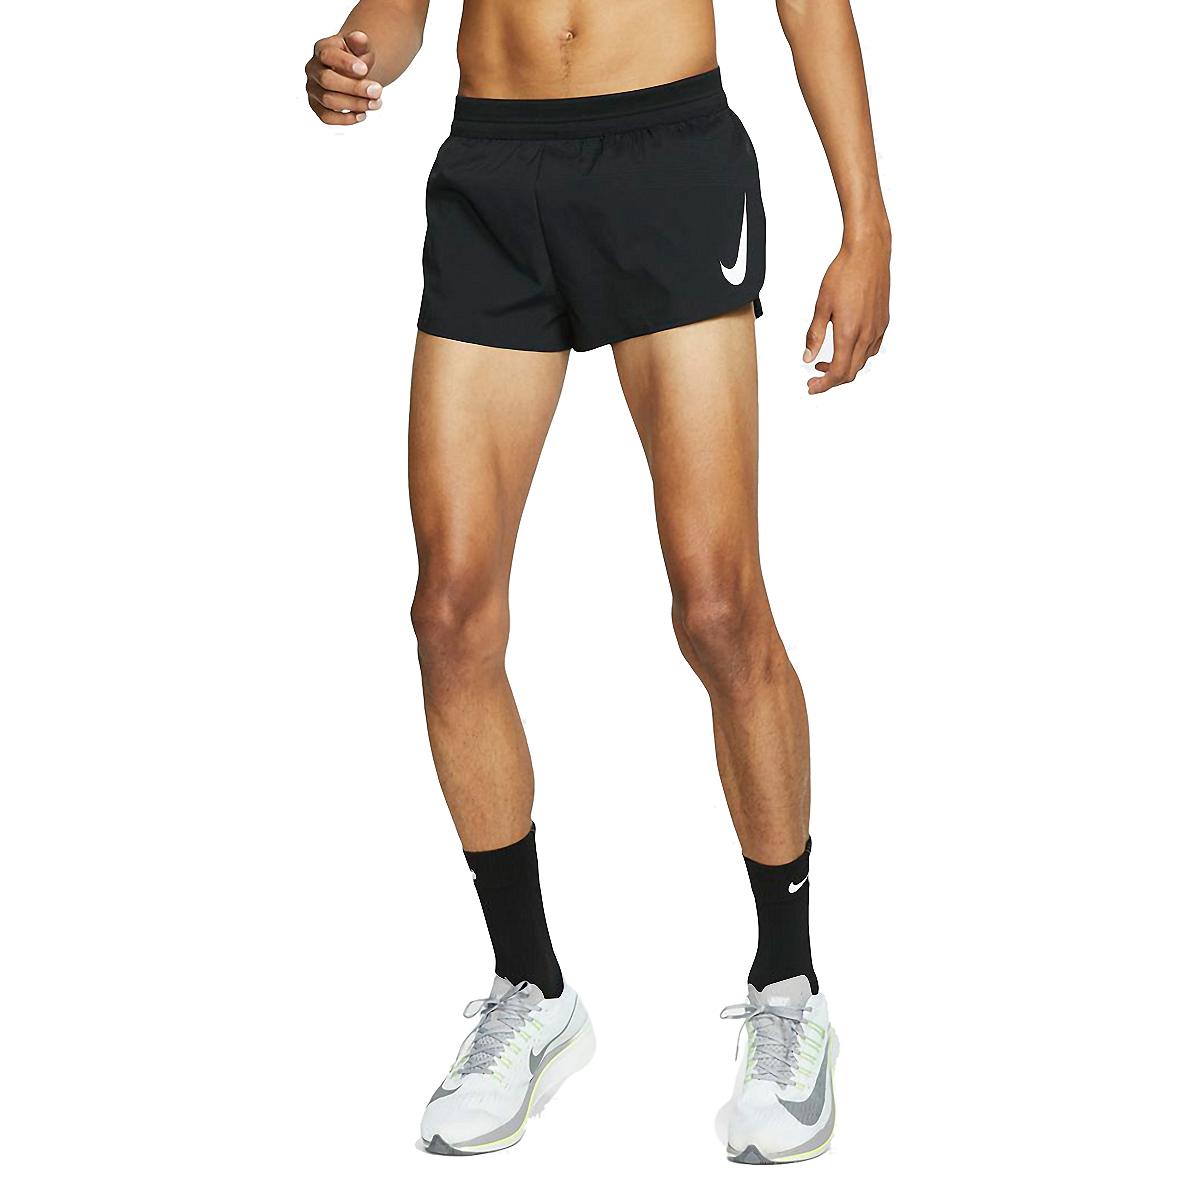 Men's Nike AeroSwift 2 Inch Short